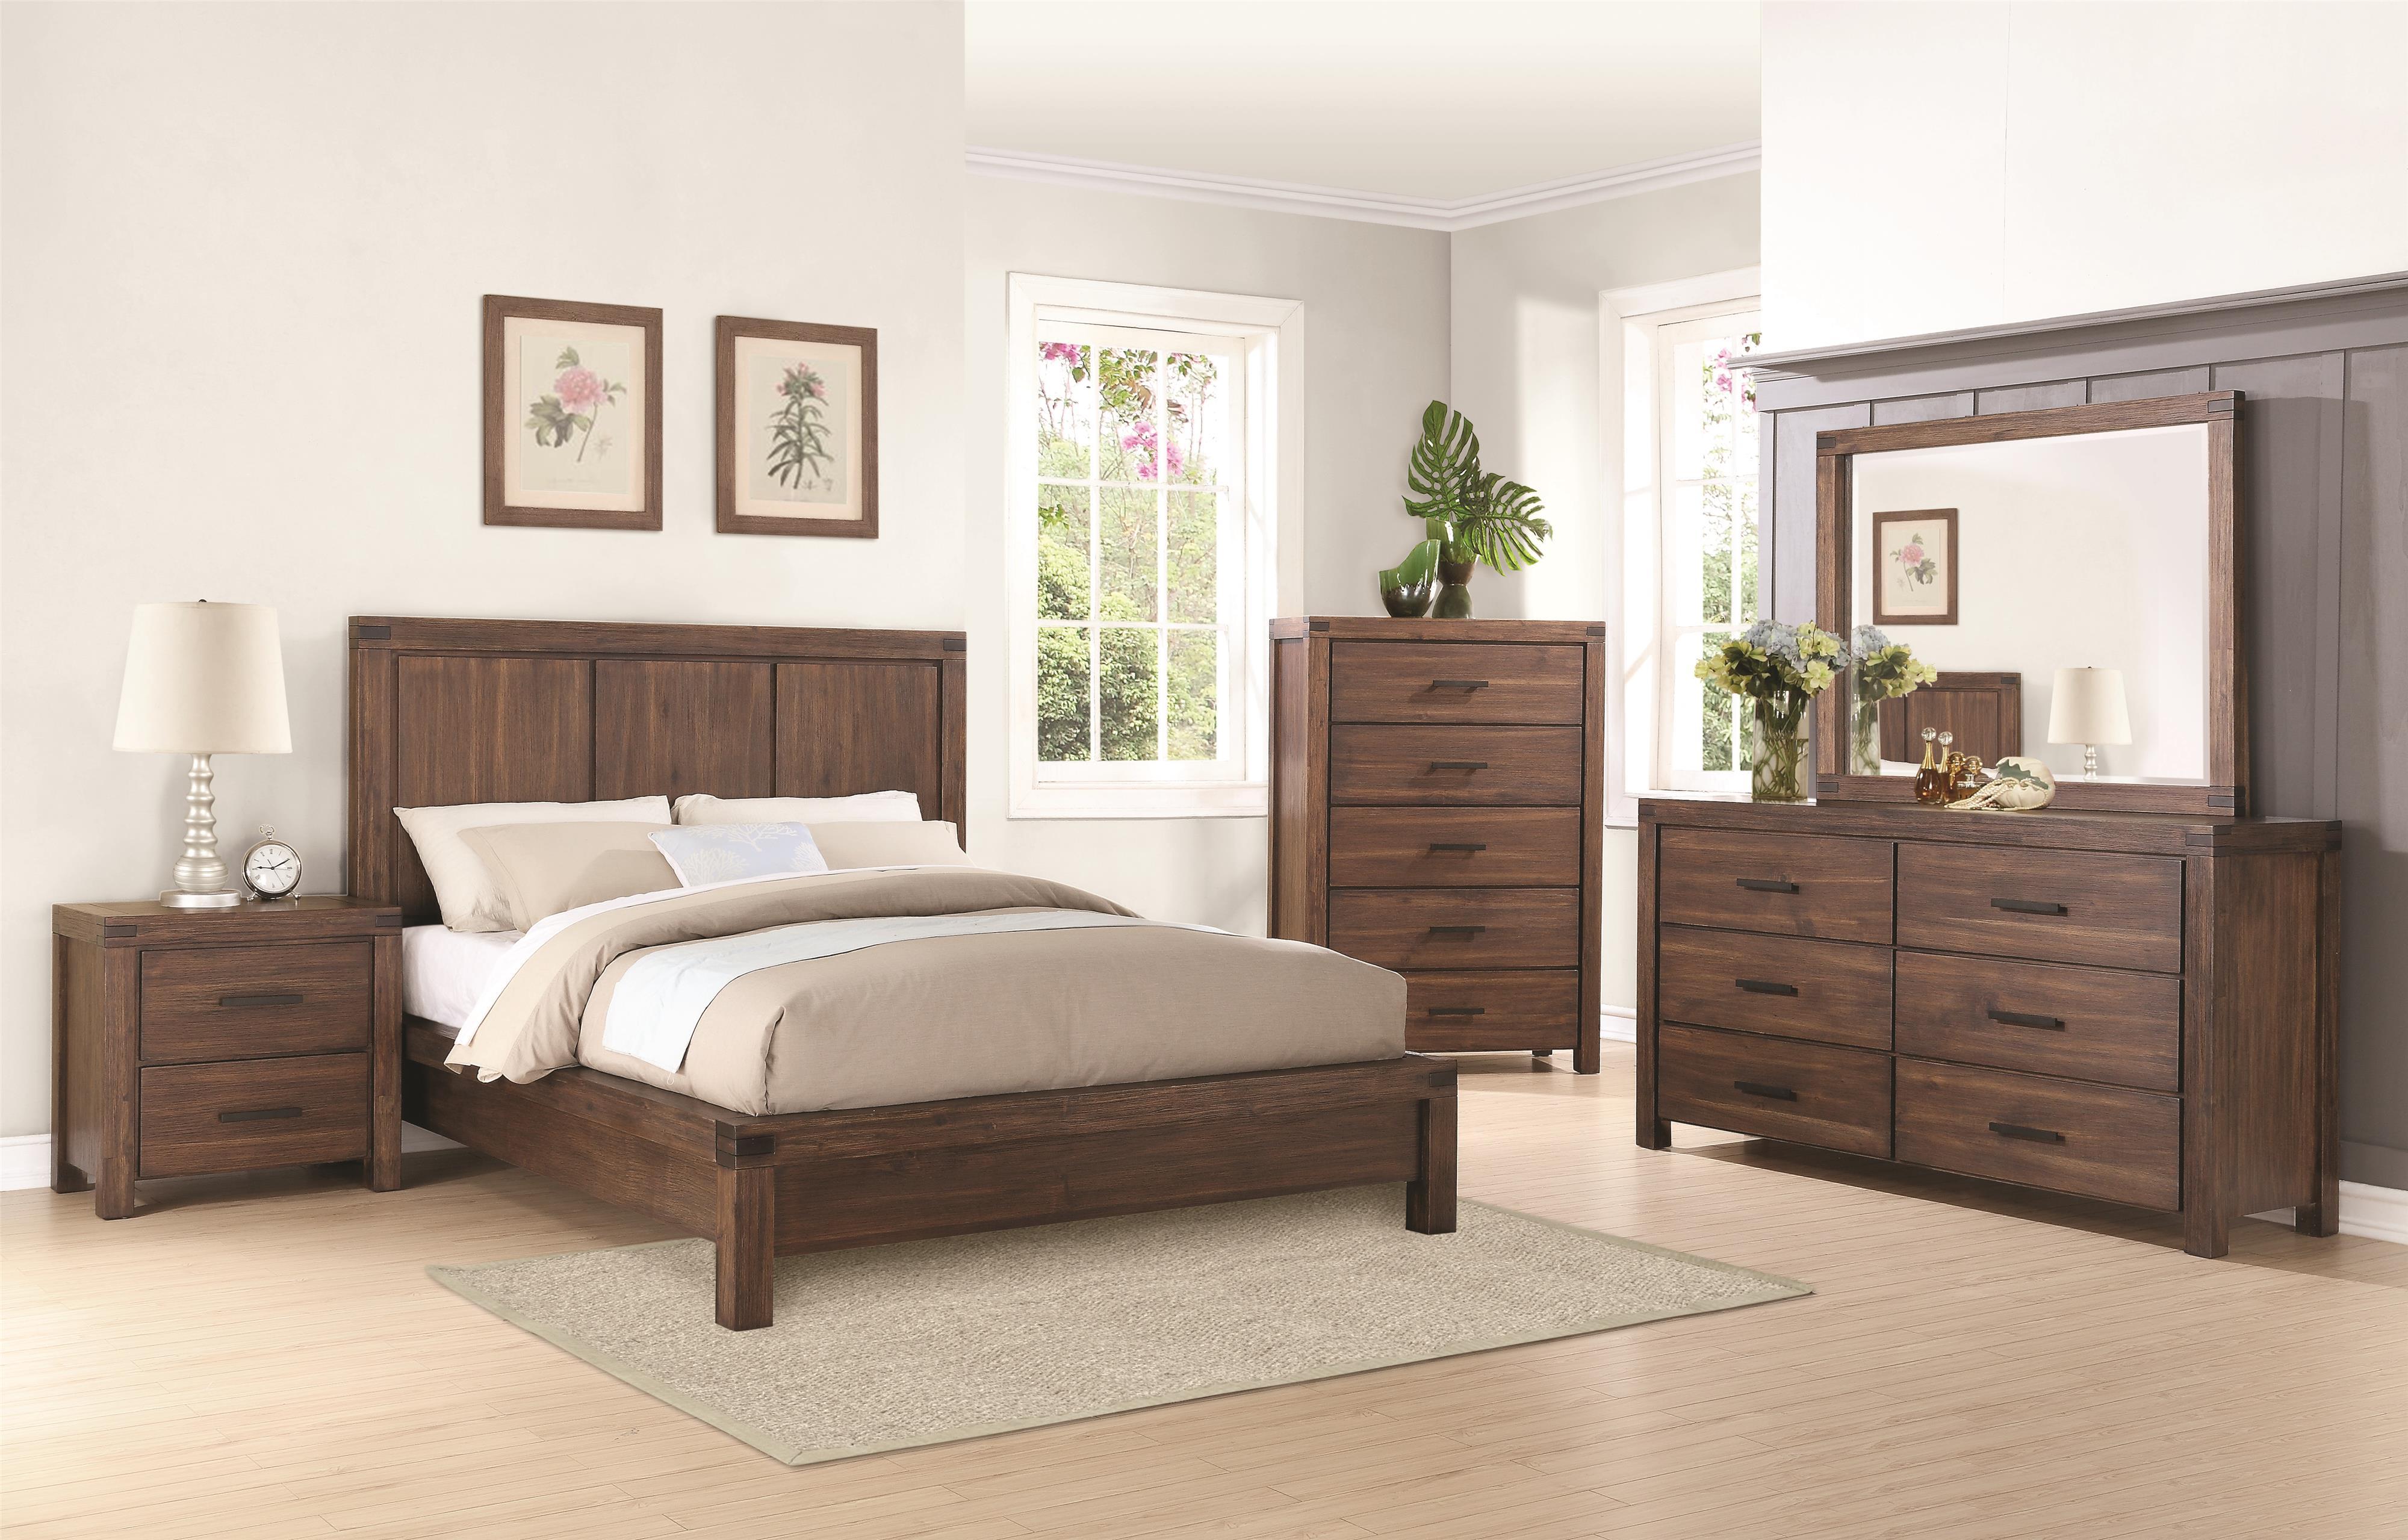 Coaster Lancashire King Bedroom Group Dunk & Bright Furniture Bedroom